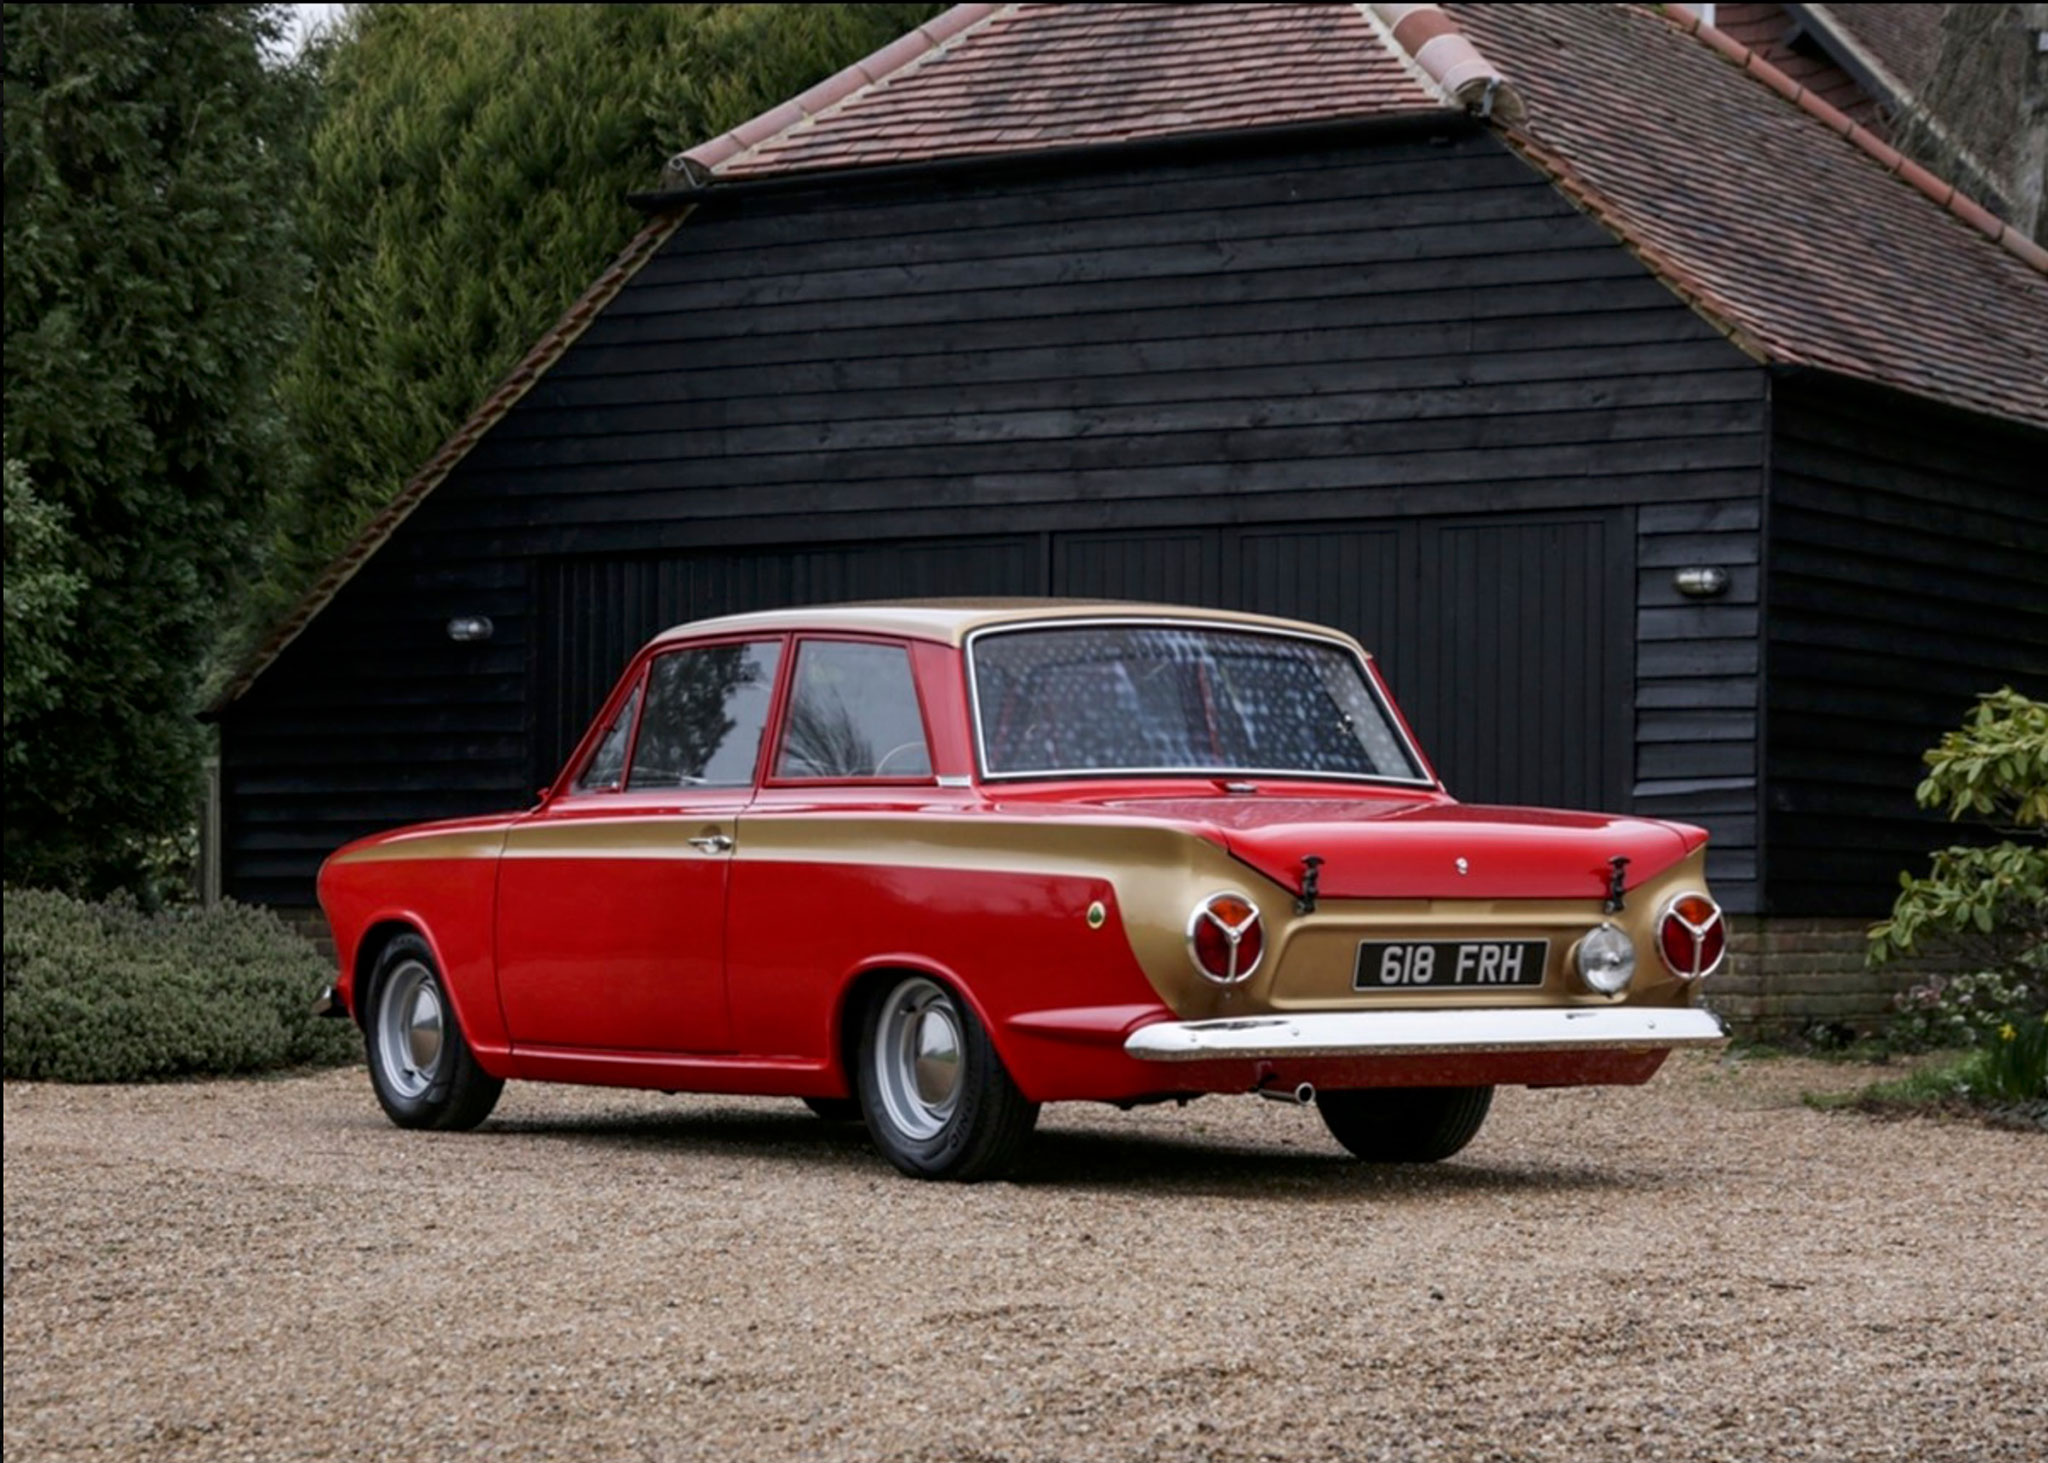 1963 Ford cortina Lotus MK I cette version porte encore le monogramme Consul qui disparaît en 1964 - Coups de Coeur Historics Auctioneers.